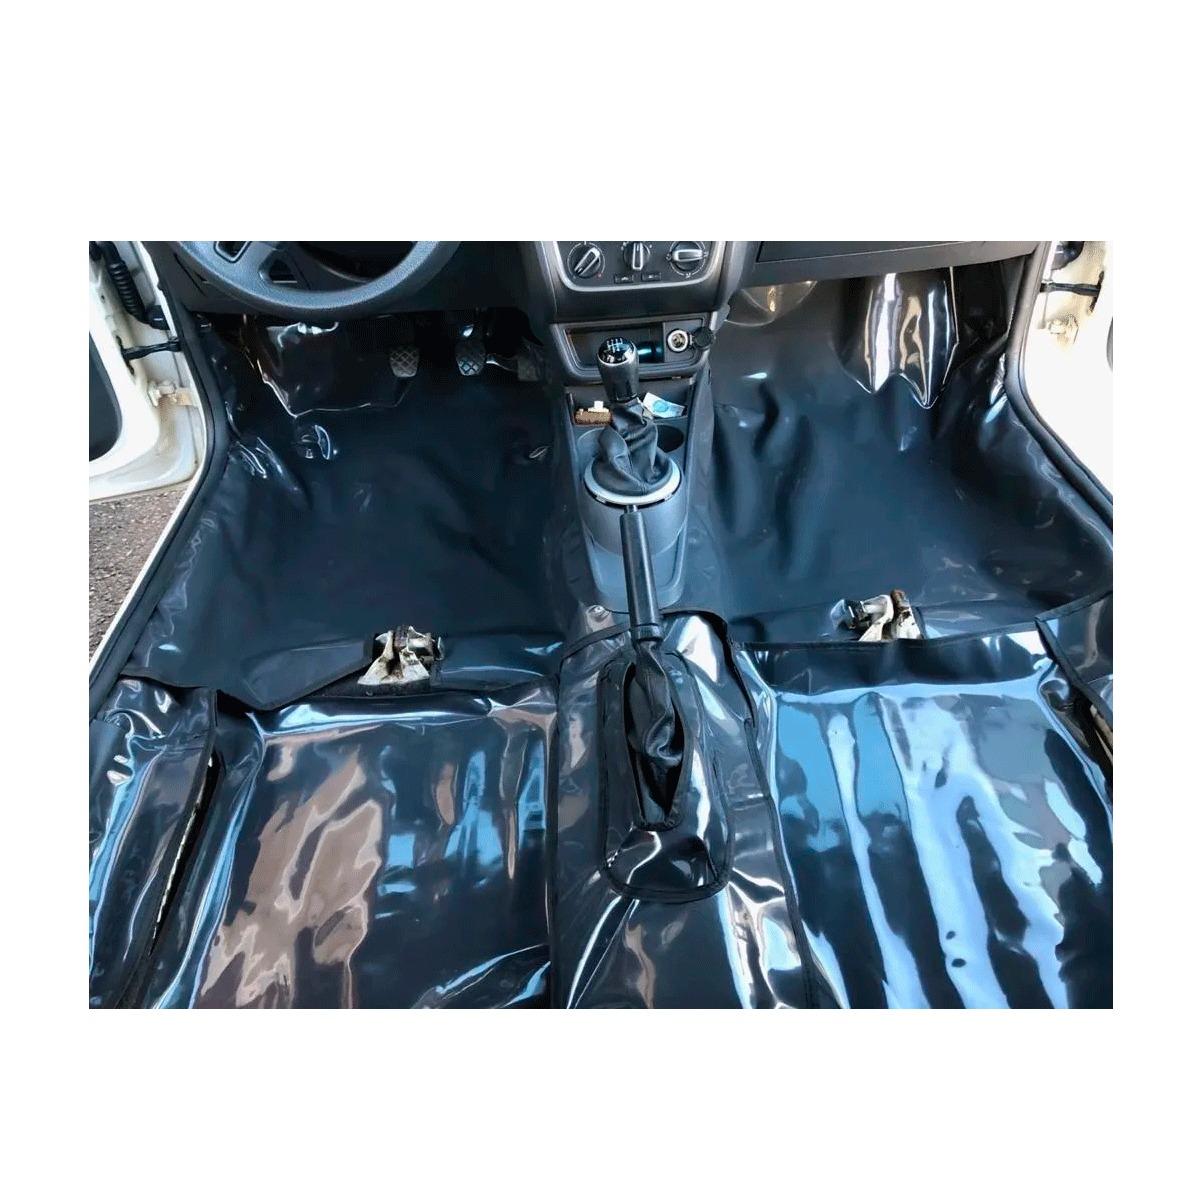 Tapete Em Vinil Volkswagen Gol G5 + Capa Banco Protecao Banco Areia Suor Academia